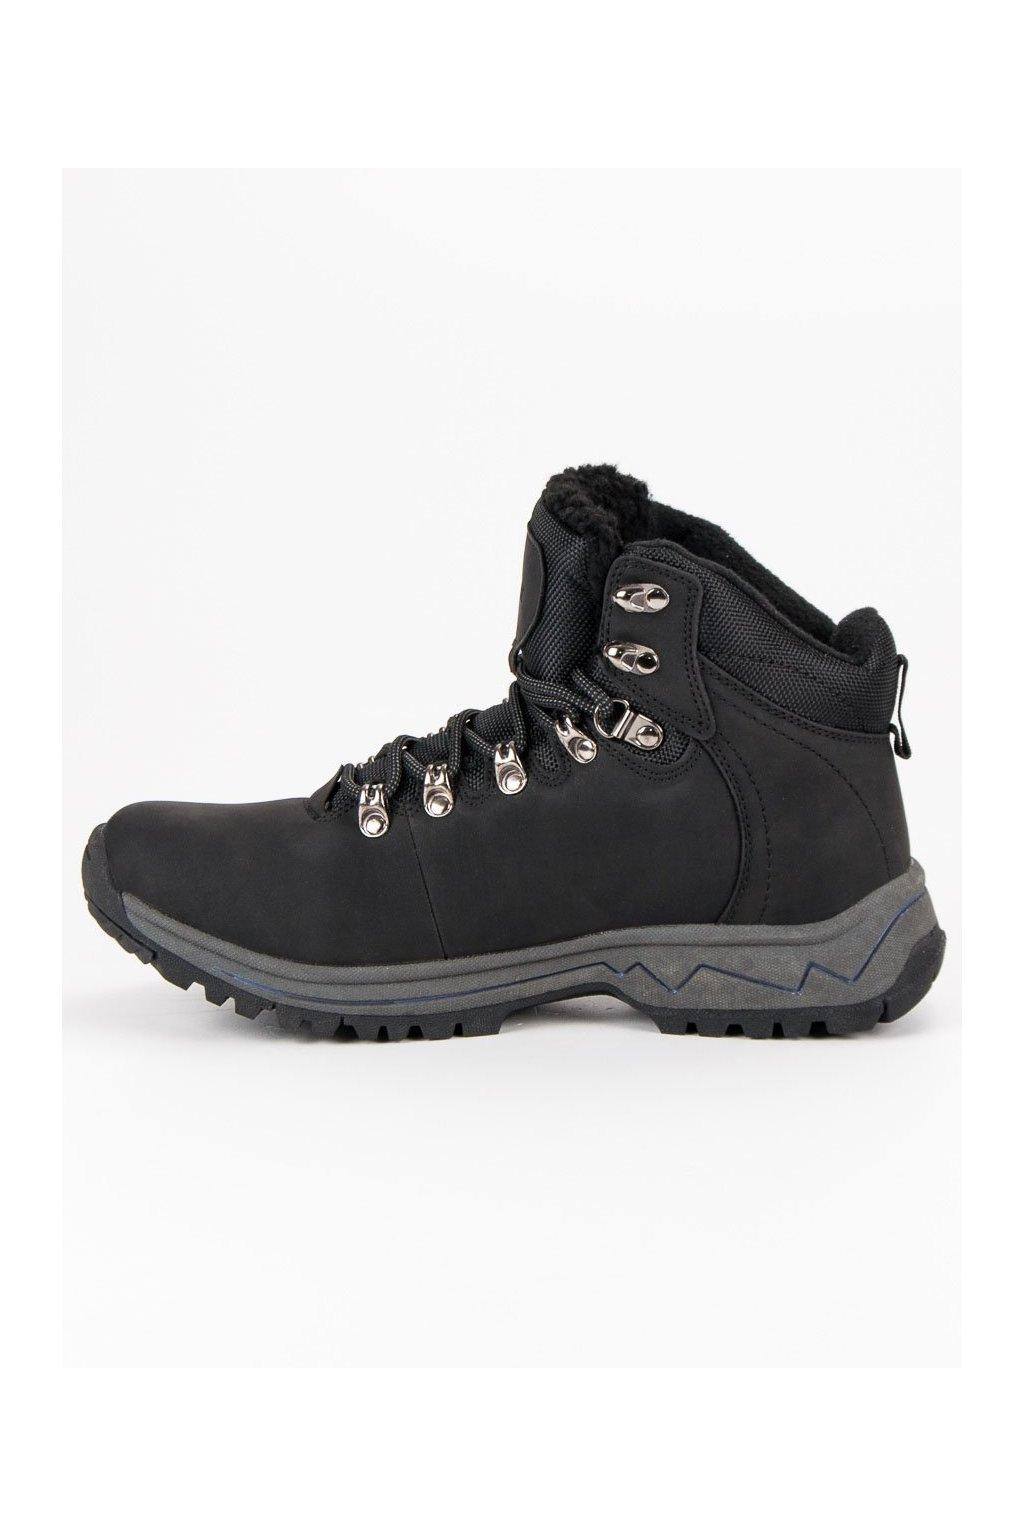 Zimné pánske topánky McKeylor čierne WAL19-12620B 8b084f142c0